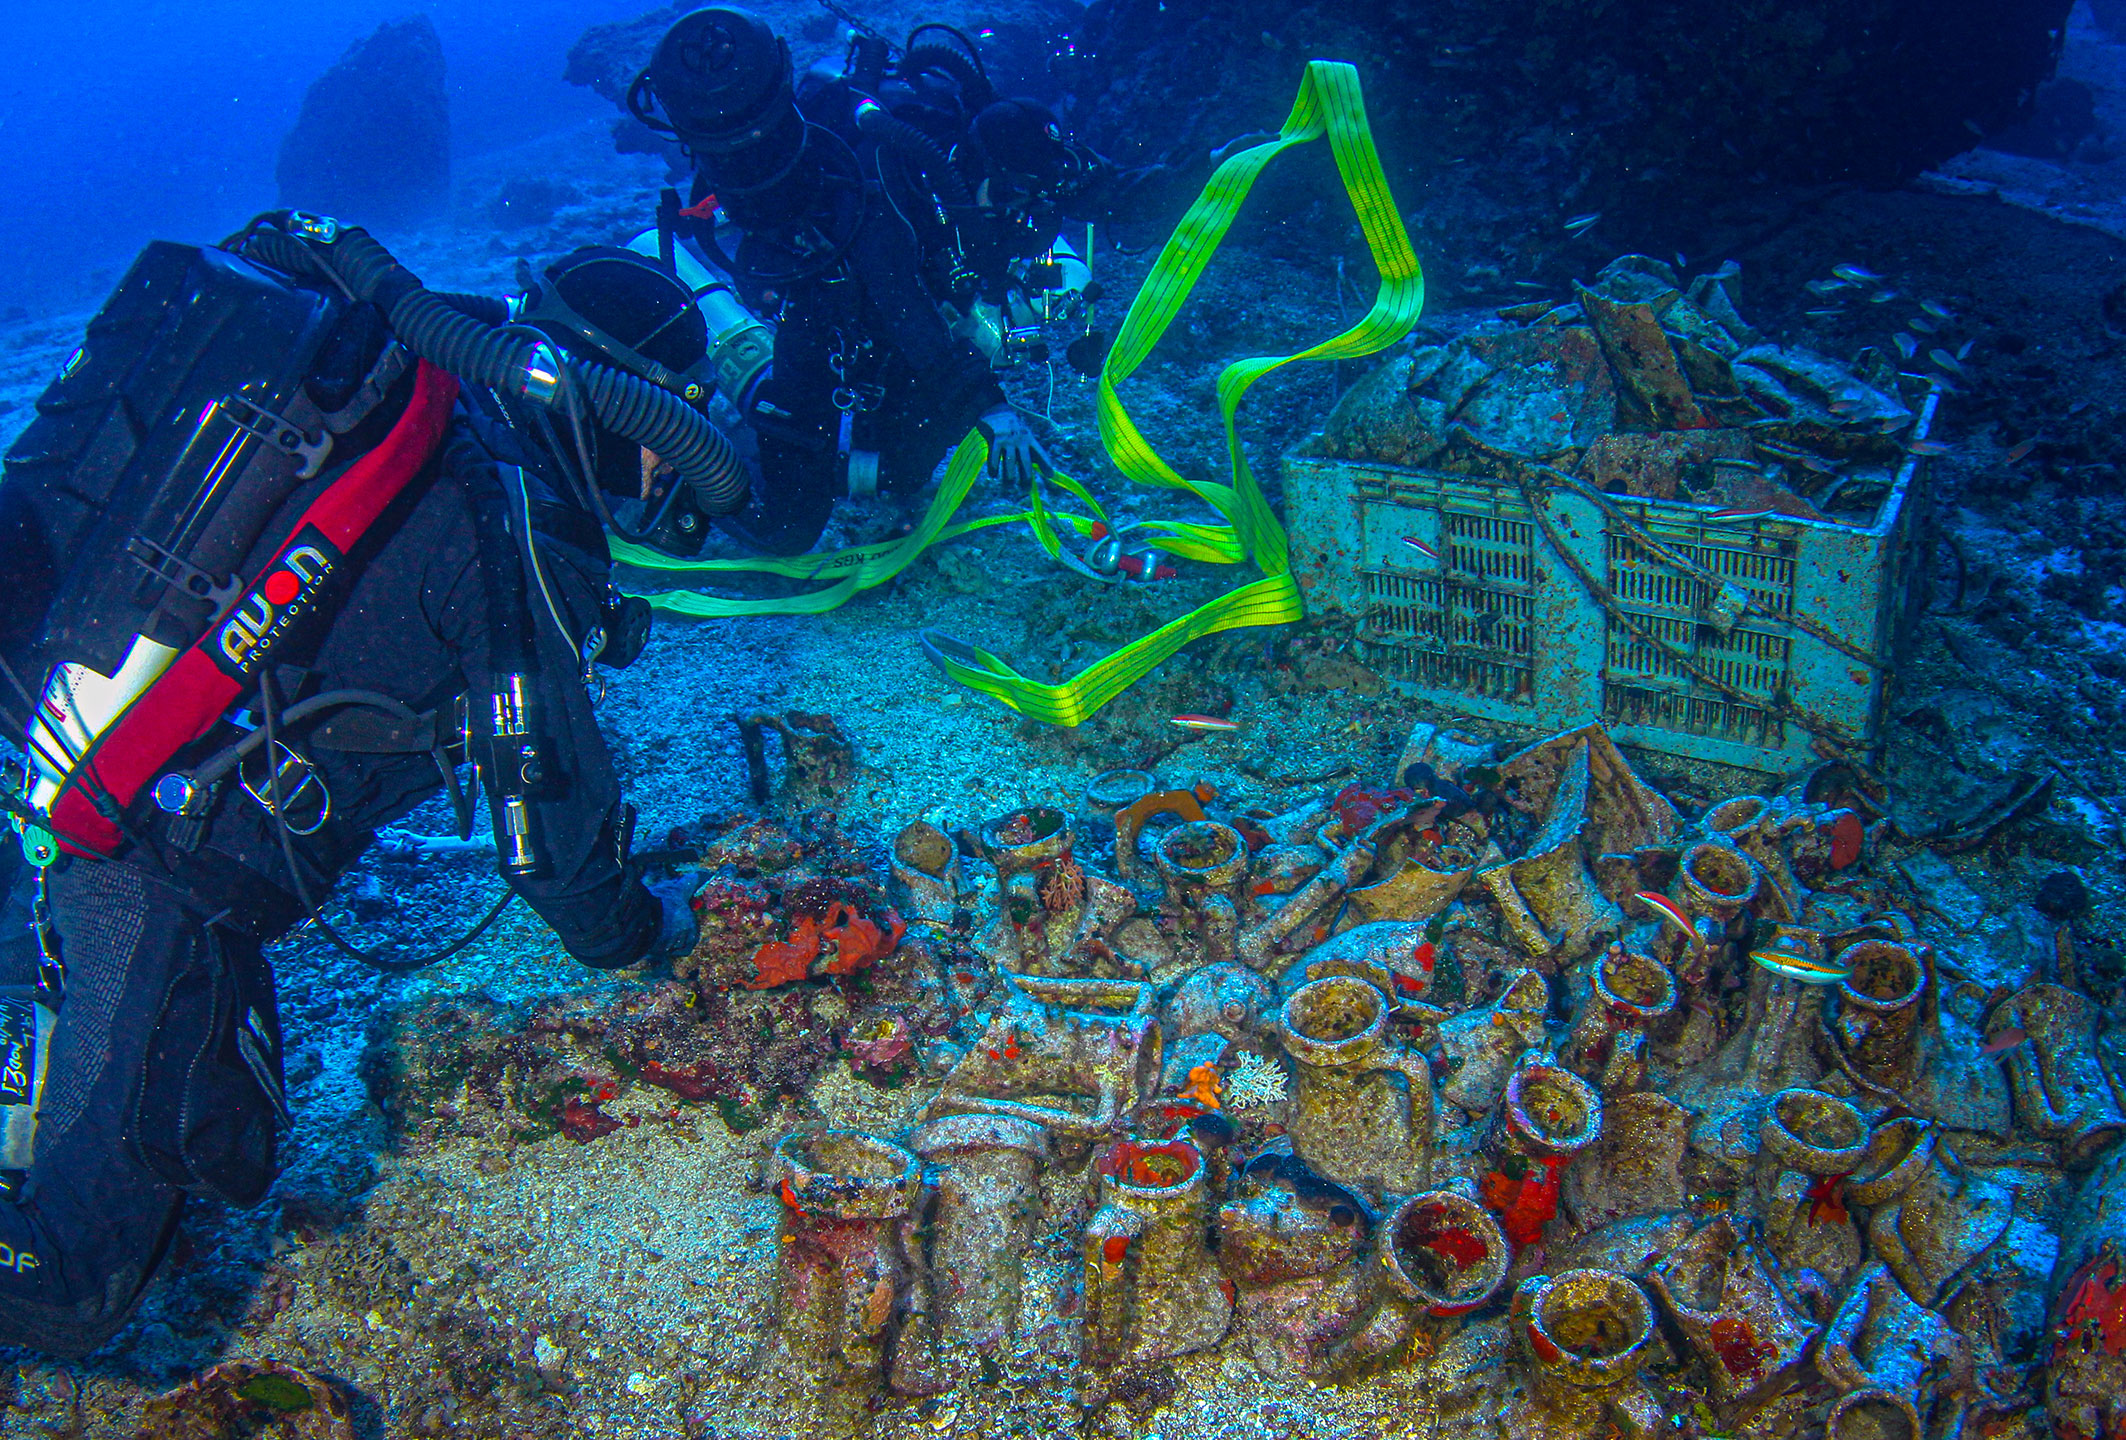 Ancient Antikythera shipwreck reveals more of its secrets